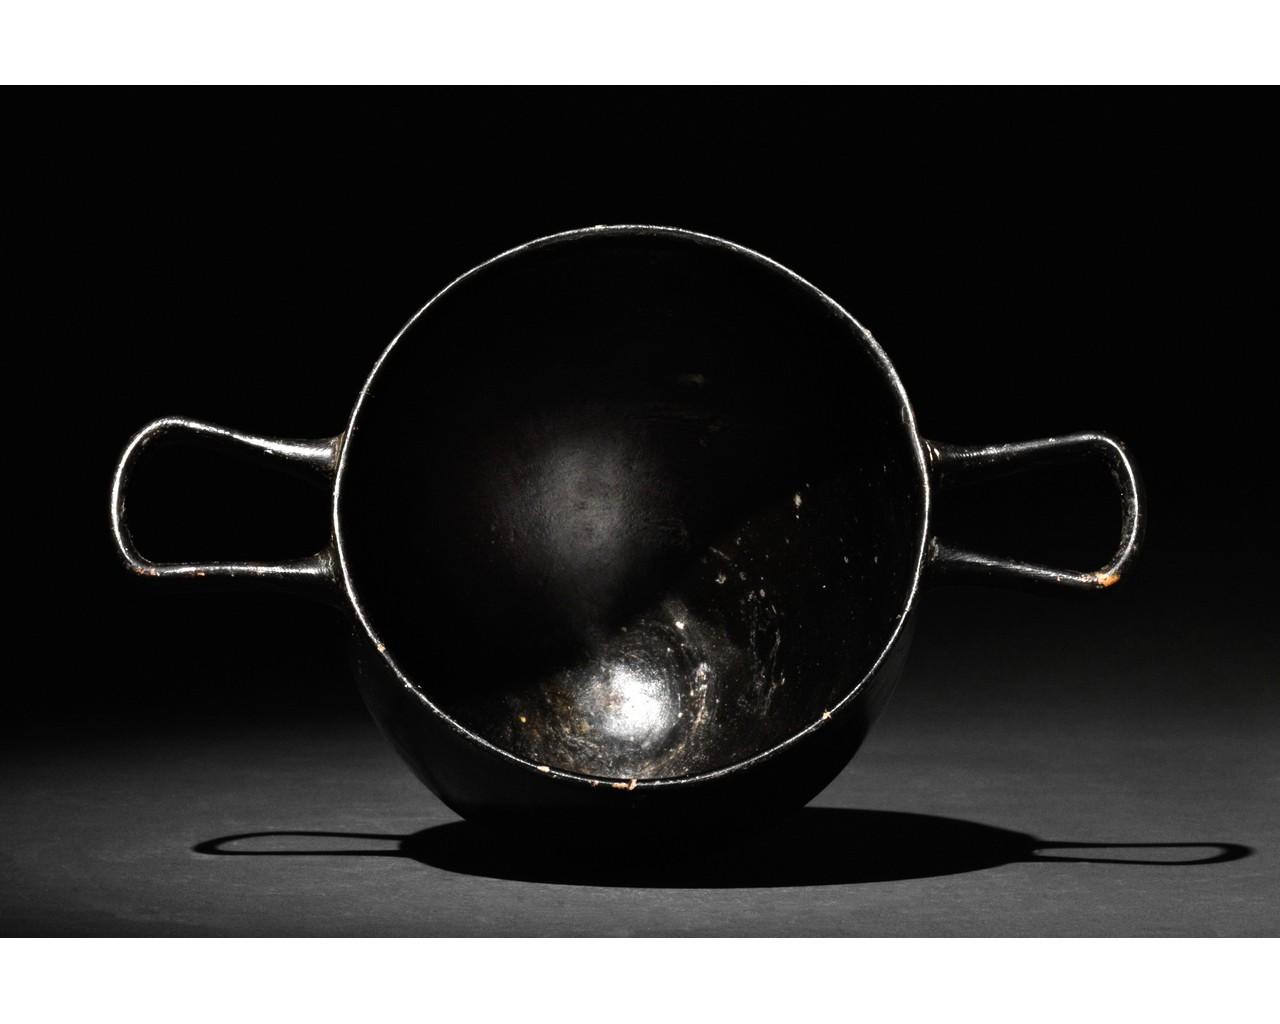 GREEK APULIAN BLACK-GLAZED POTTERY SKYPHOS - Image 4 of 6